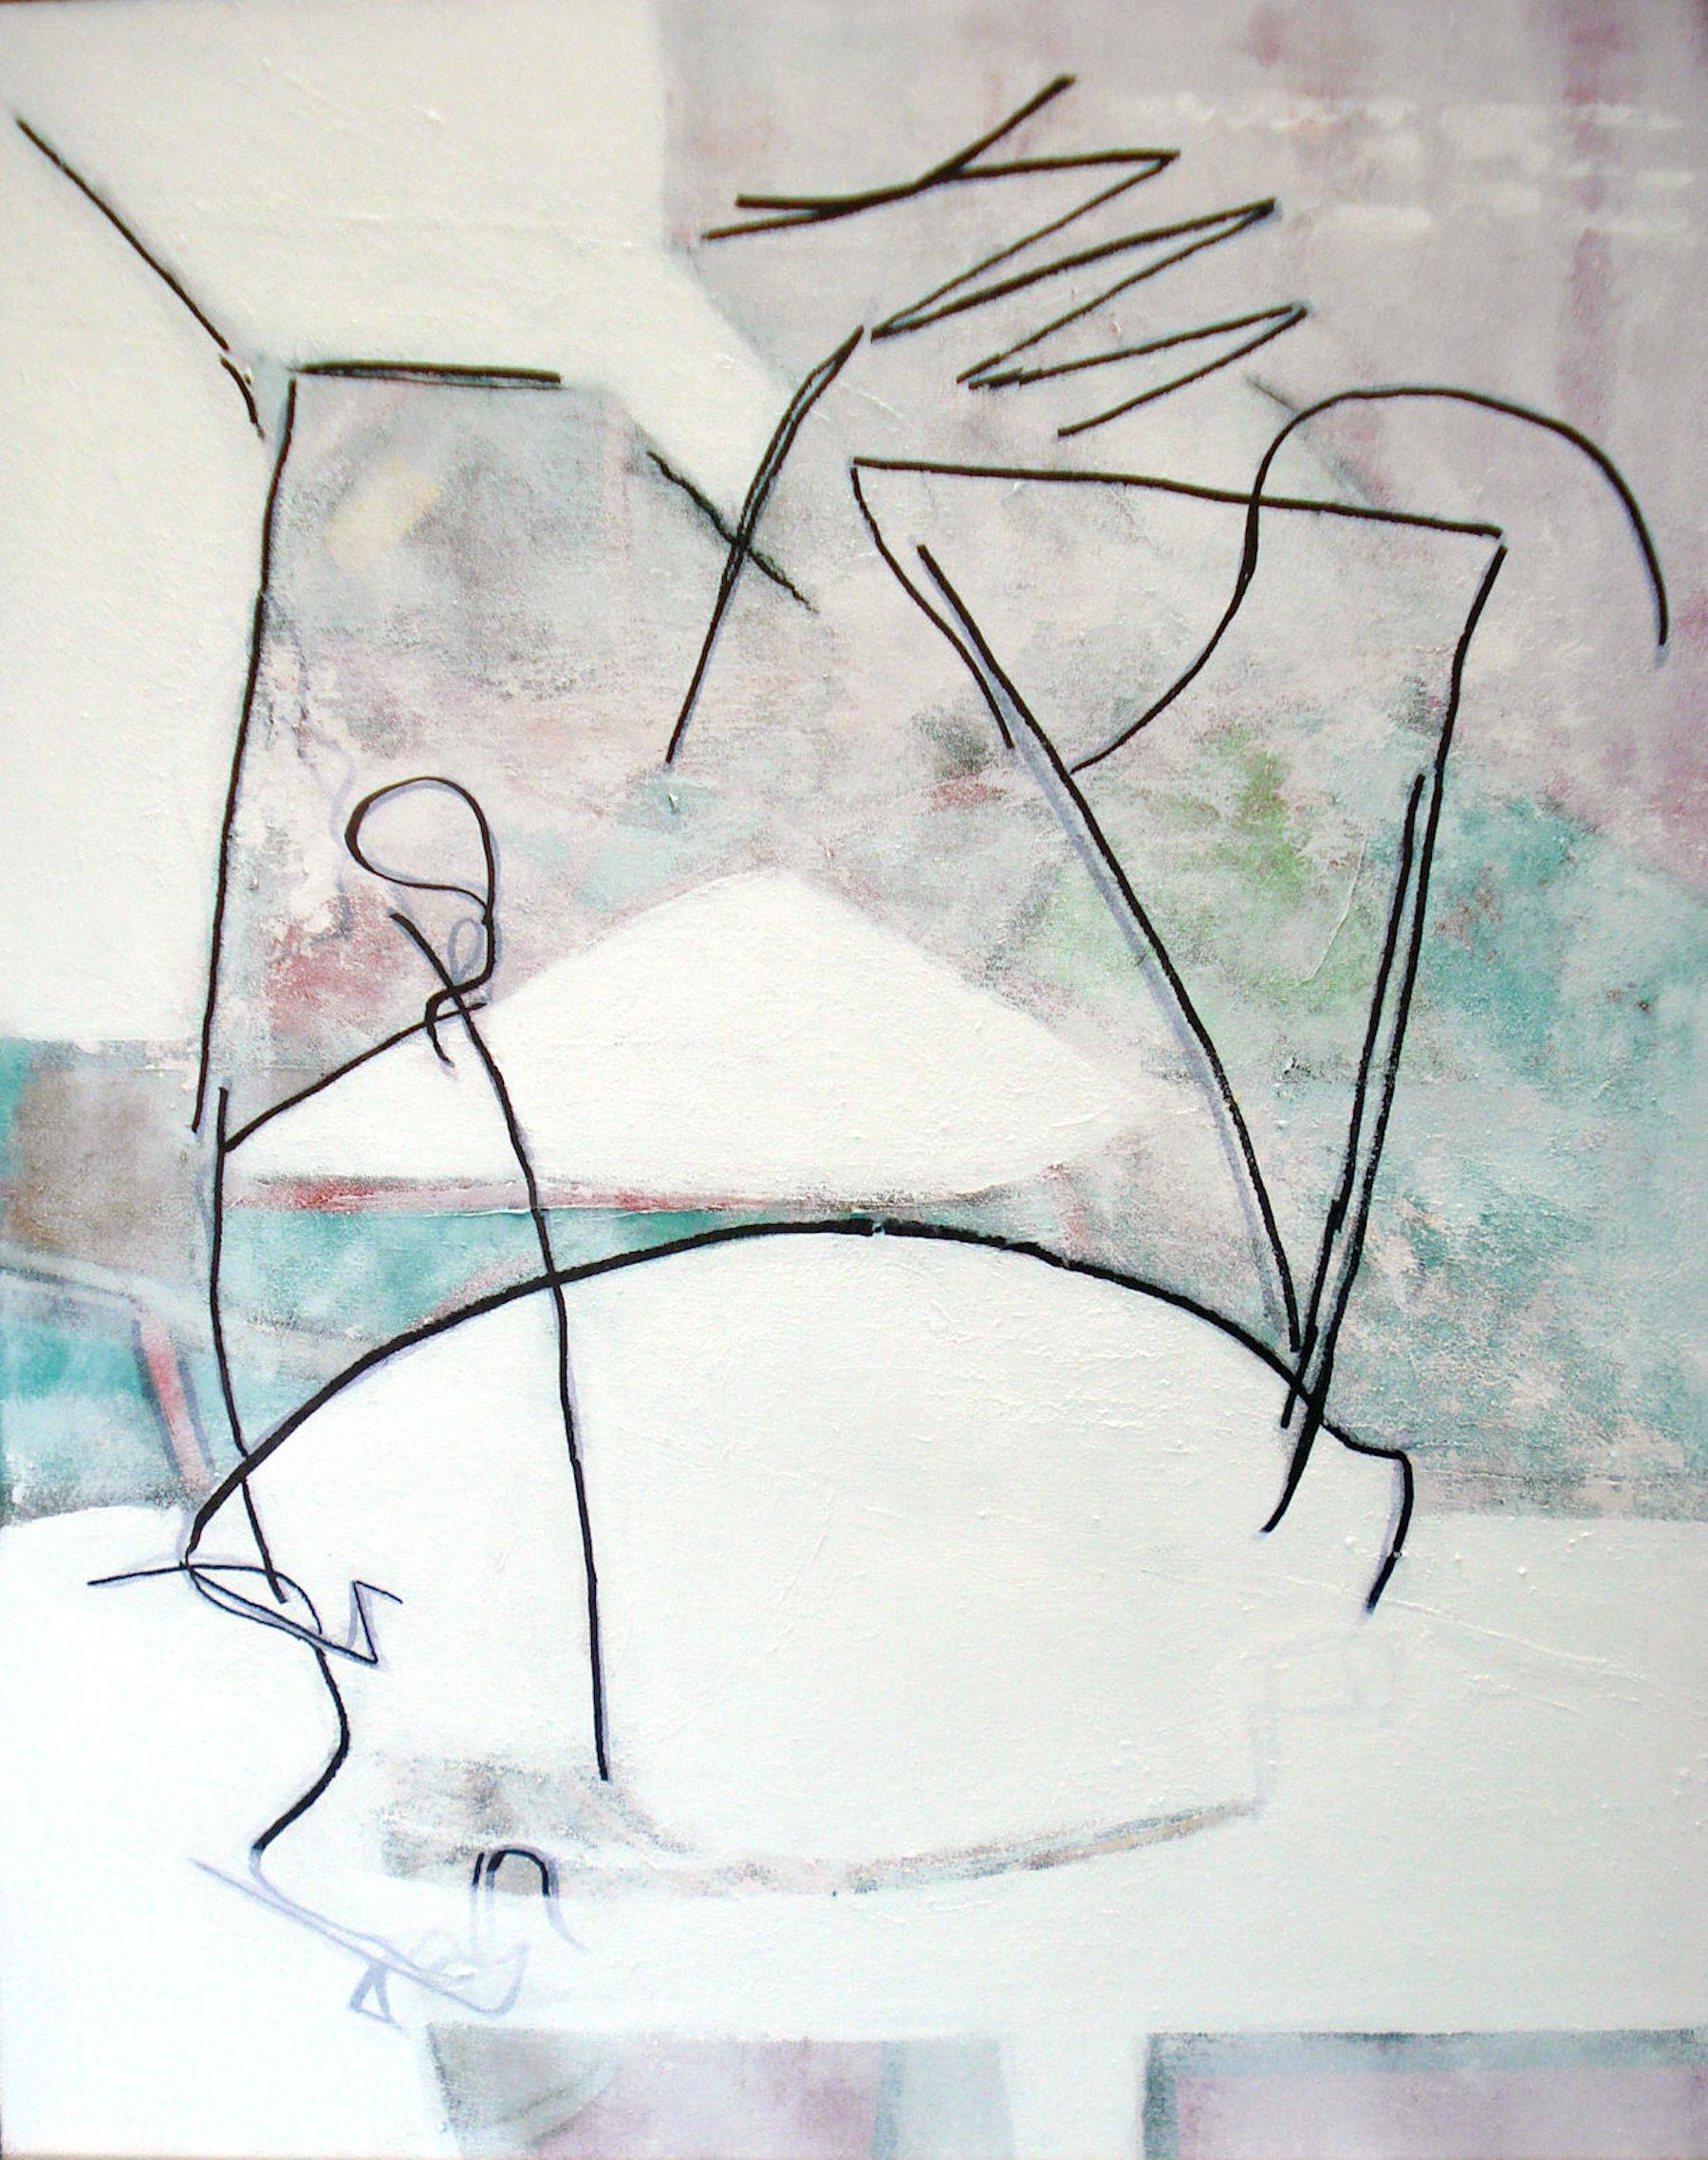 Pat Paxson, Fragility , mixed media on canvas, 30x24